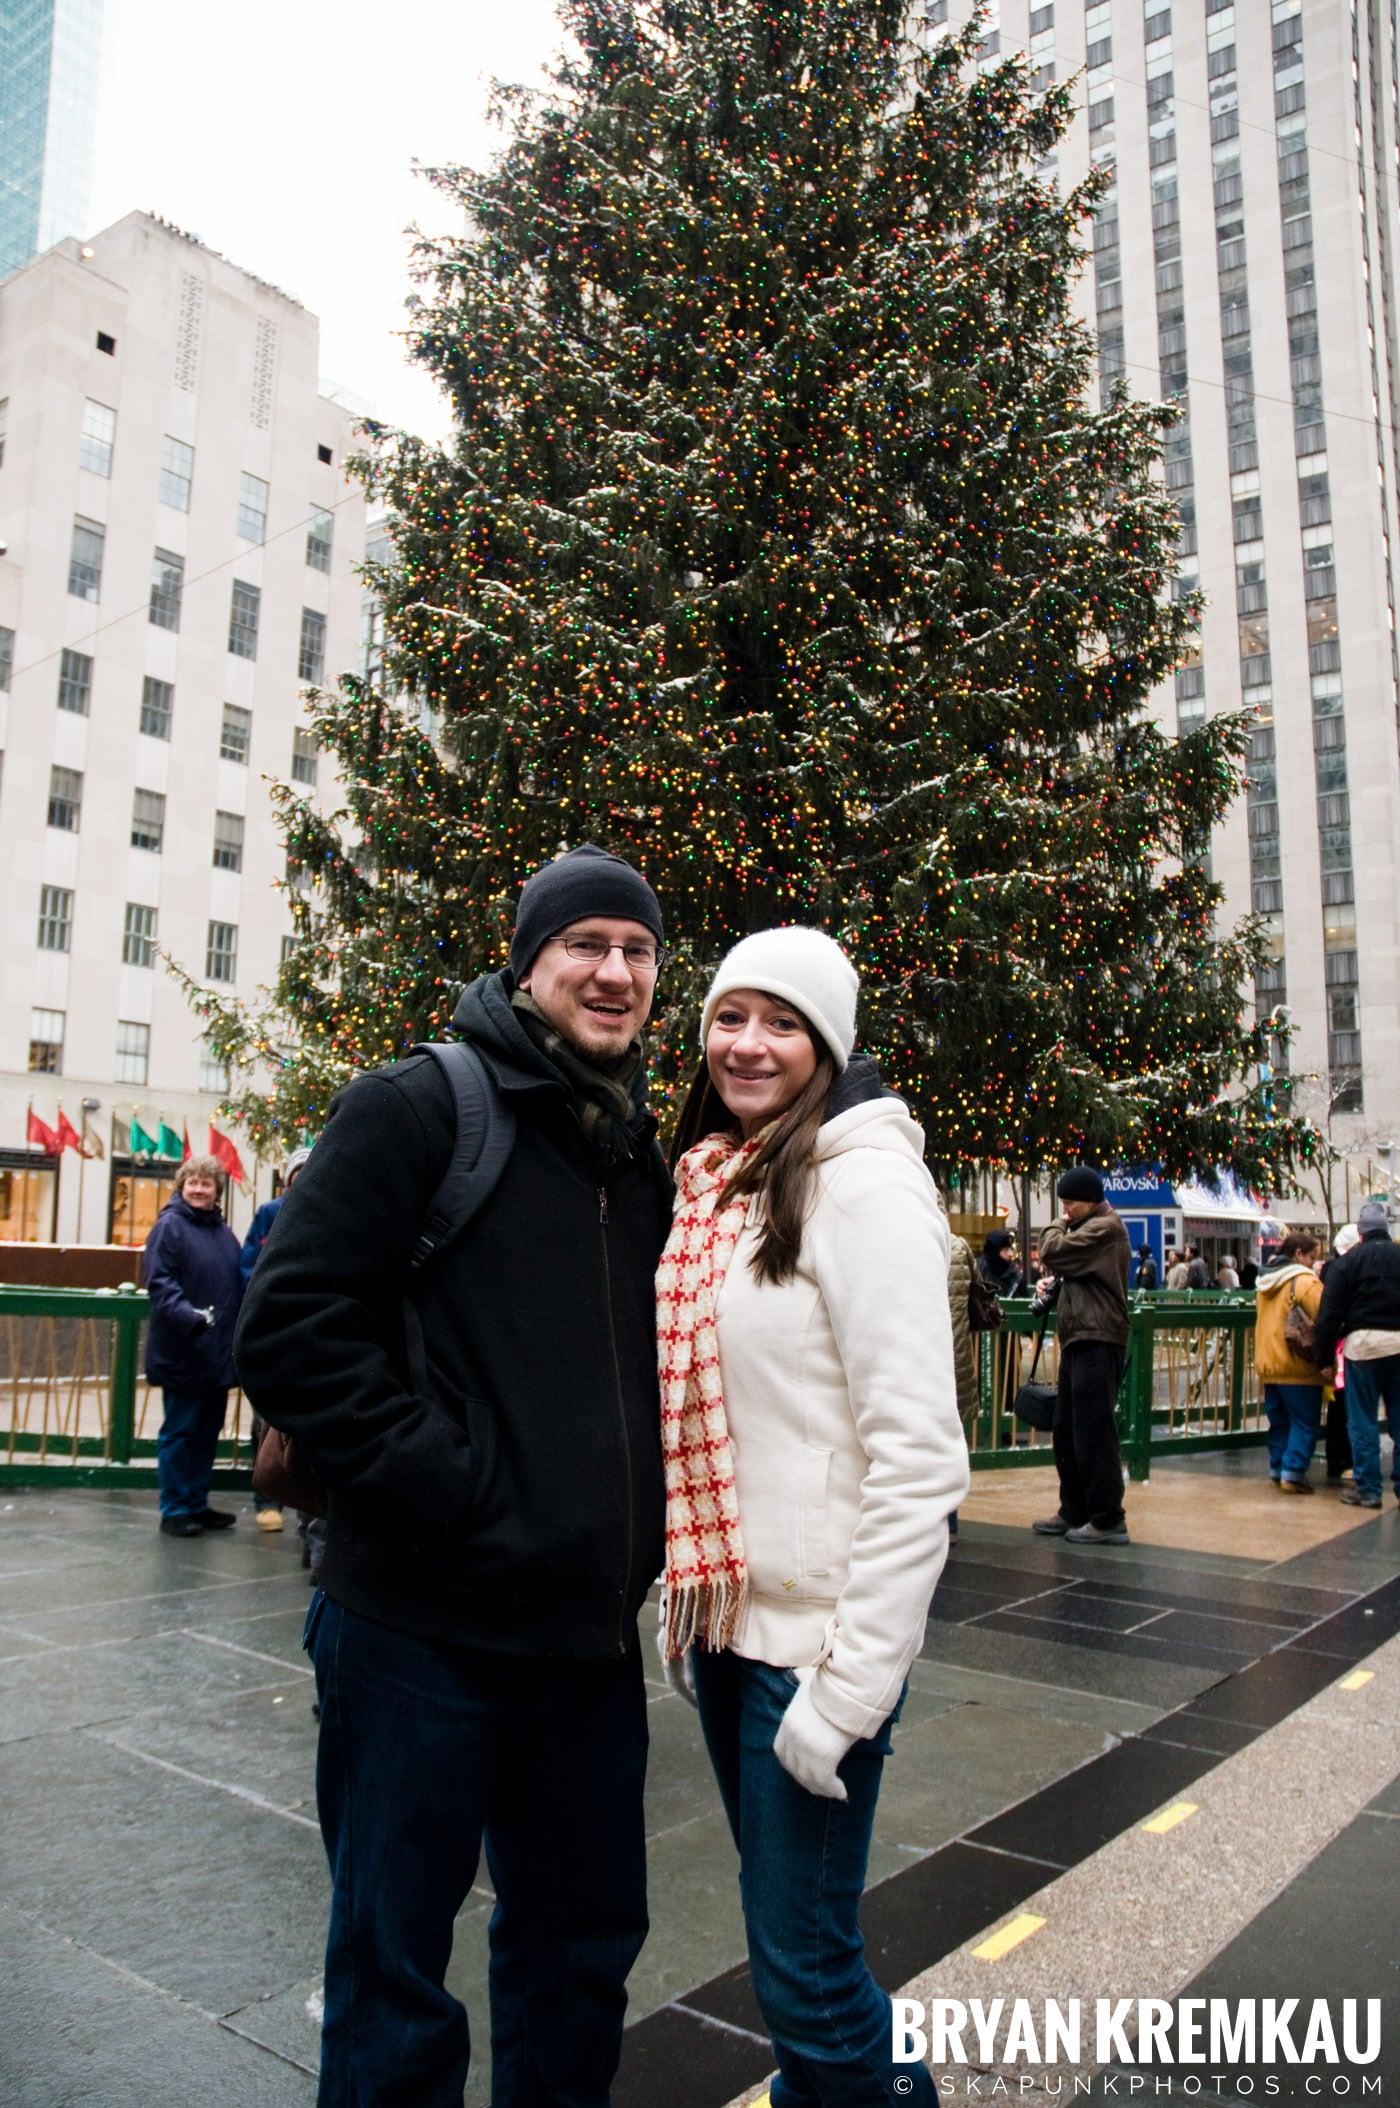 NYC Holiday Trip - 12.20.08 (49)